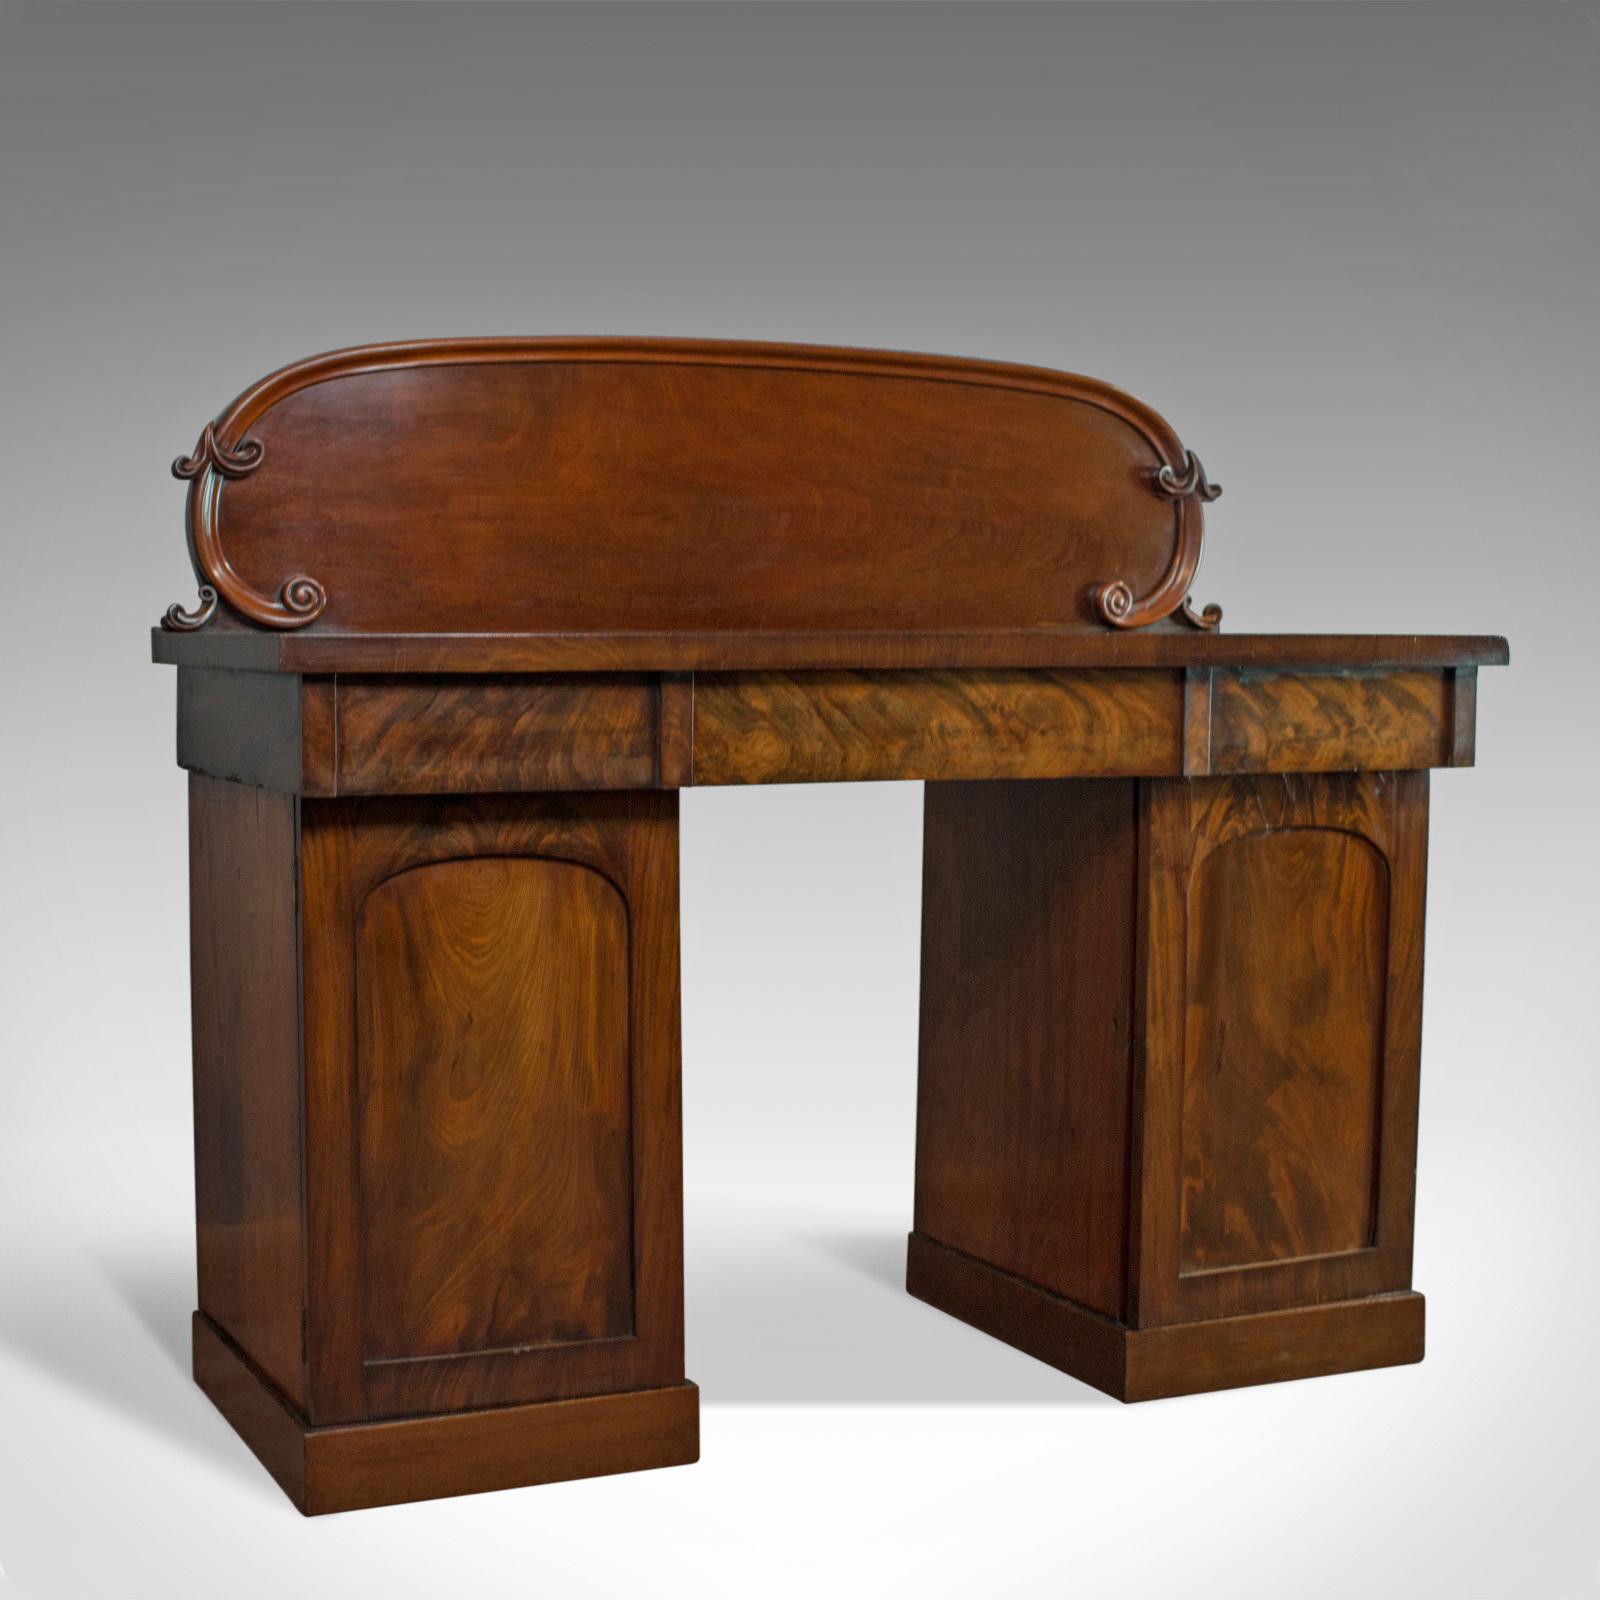 Antique Pedestal Sideboard English Mahogany Dresser Victorian Circa 1850 Vinterior